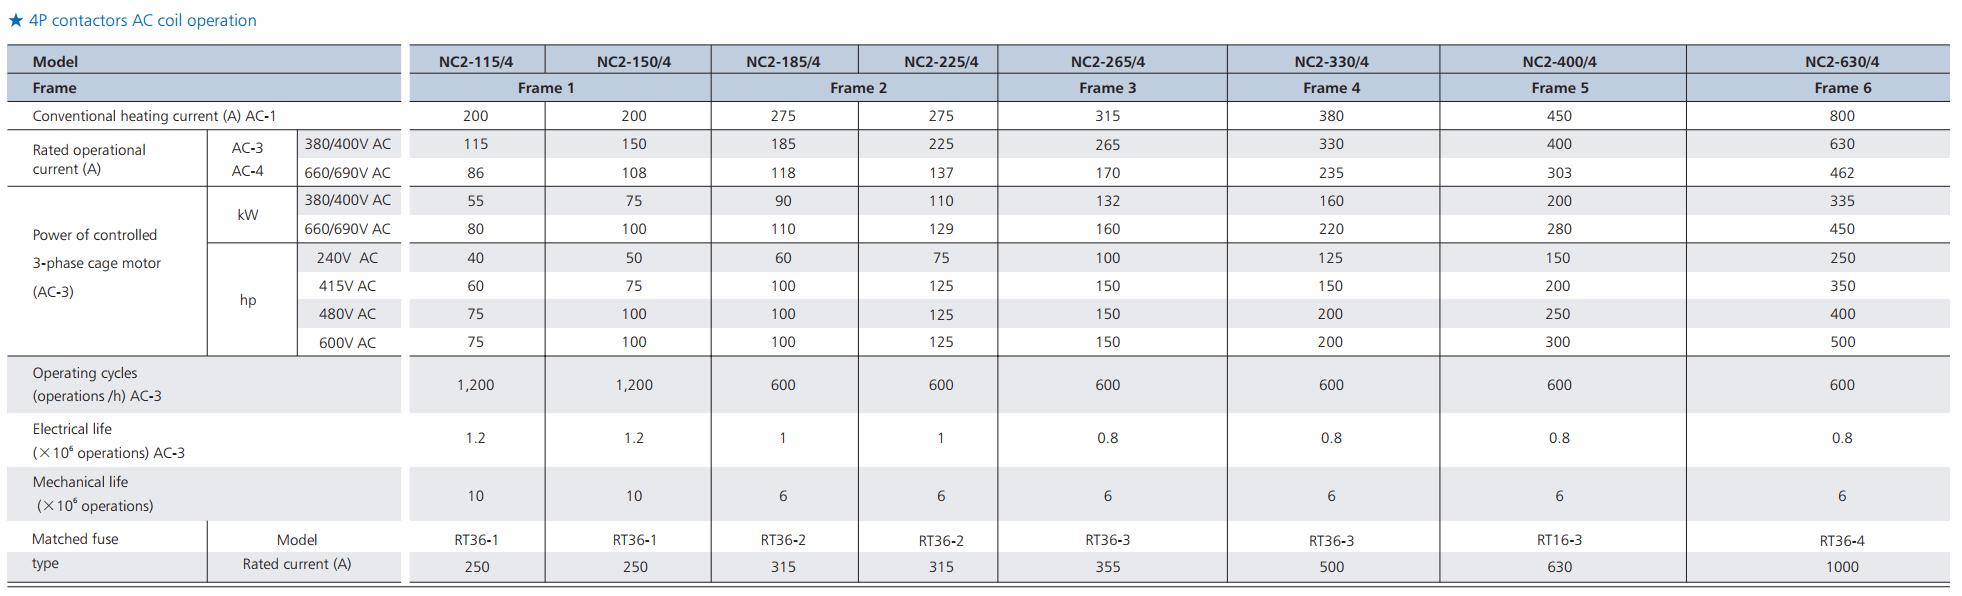 thông số contactor nc2 4p